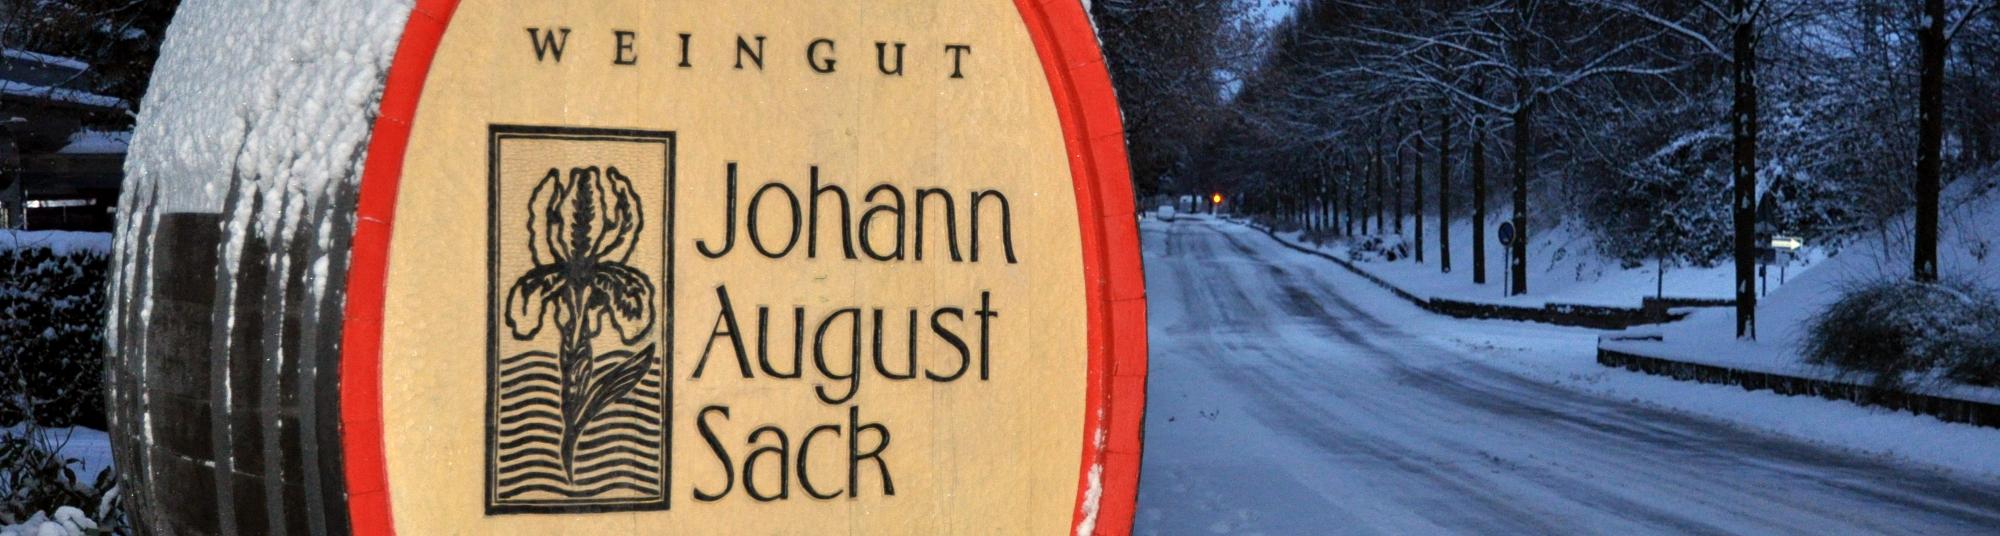 Weingut Johann August Sack - Winter 1